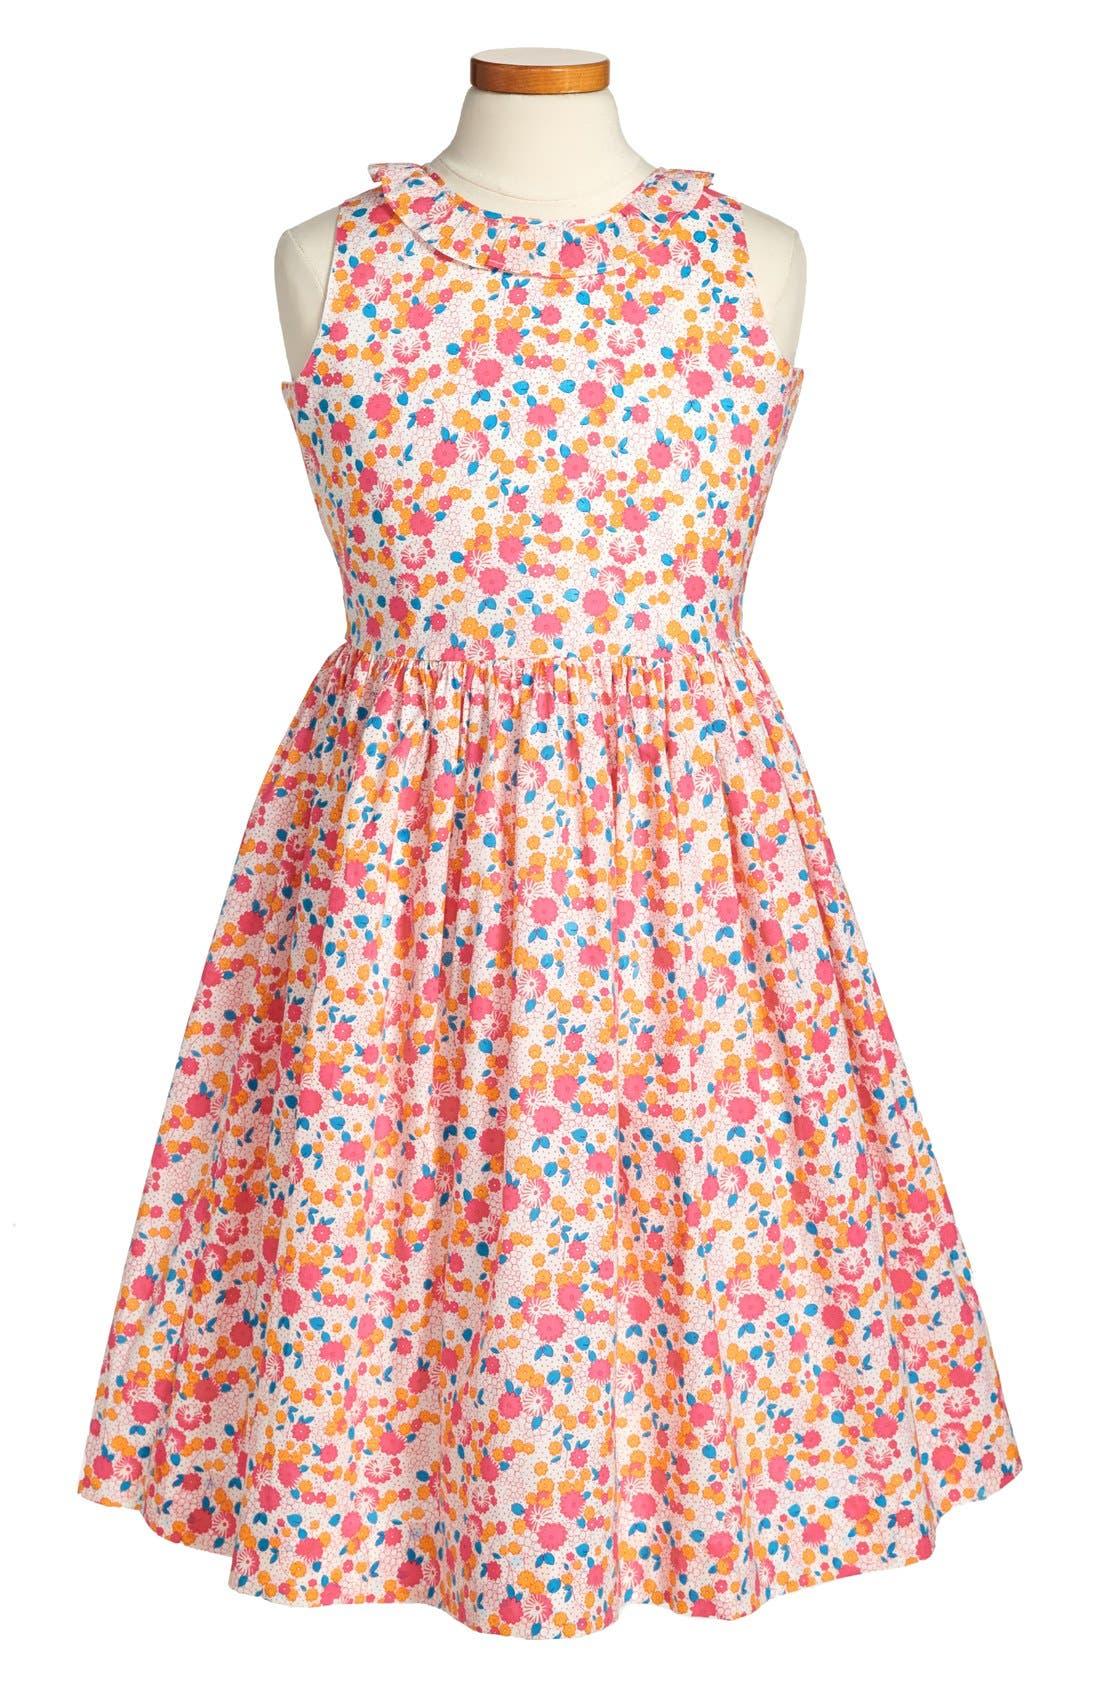 Alternate Image 1 Selected - Oscar de la Renta Ruffle Collar Dress (Toddler Girls, Little Girls & Big Girls)